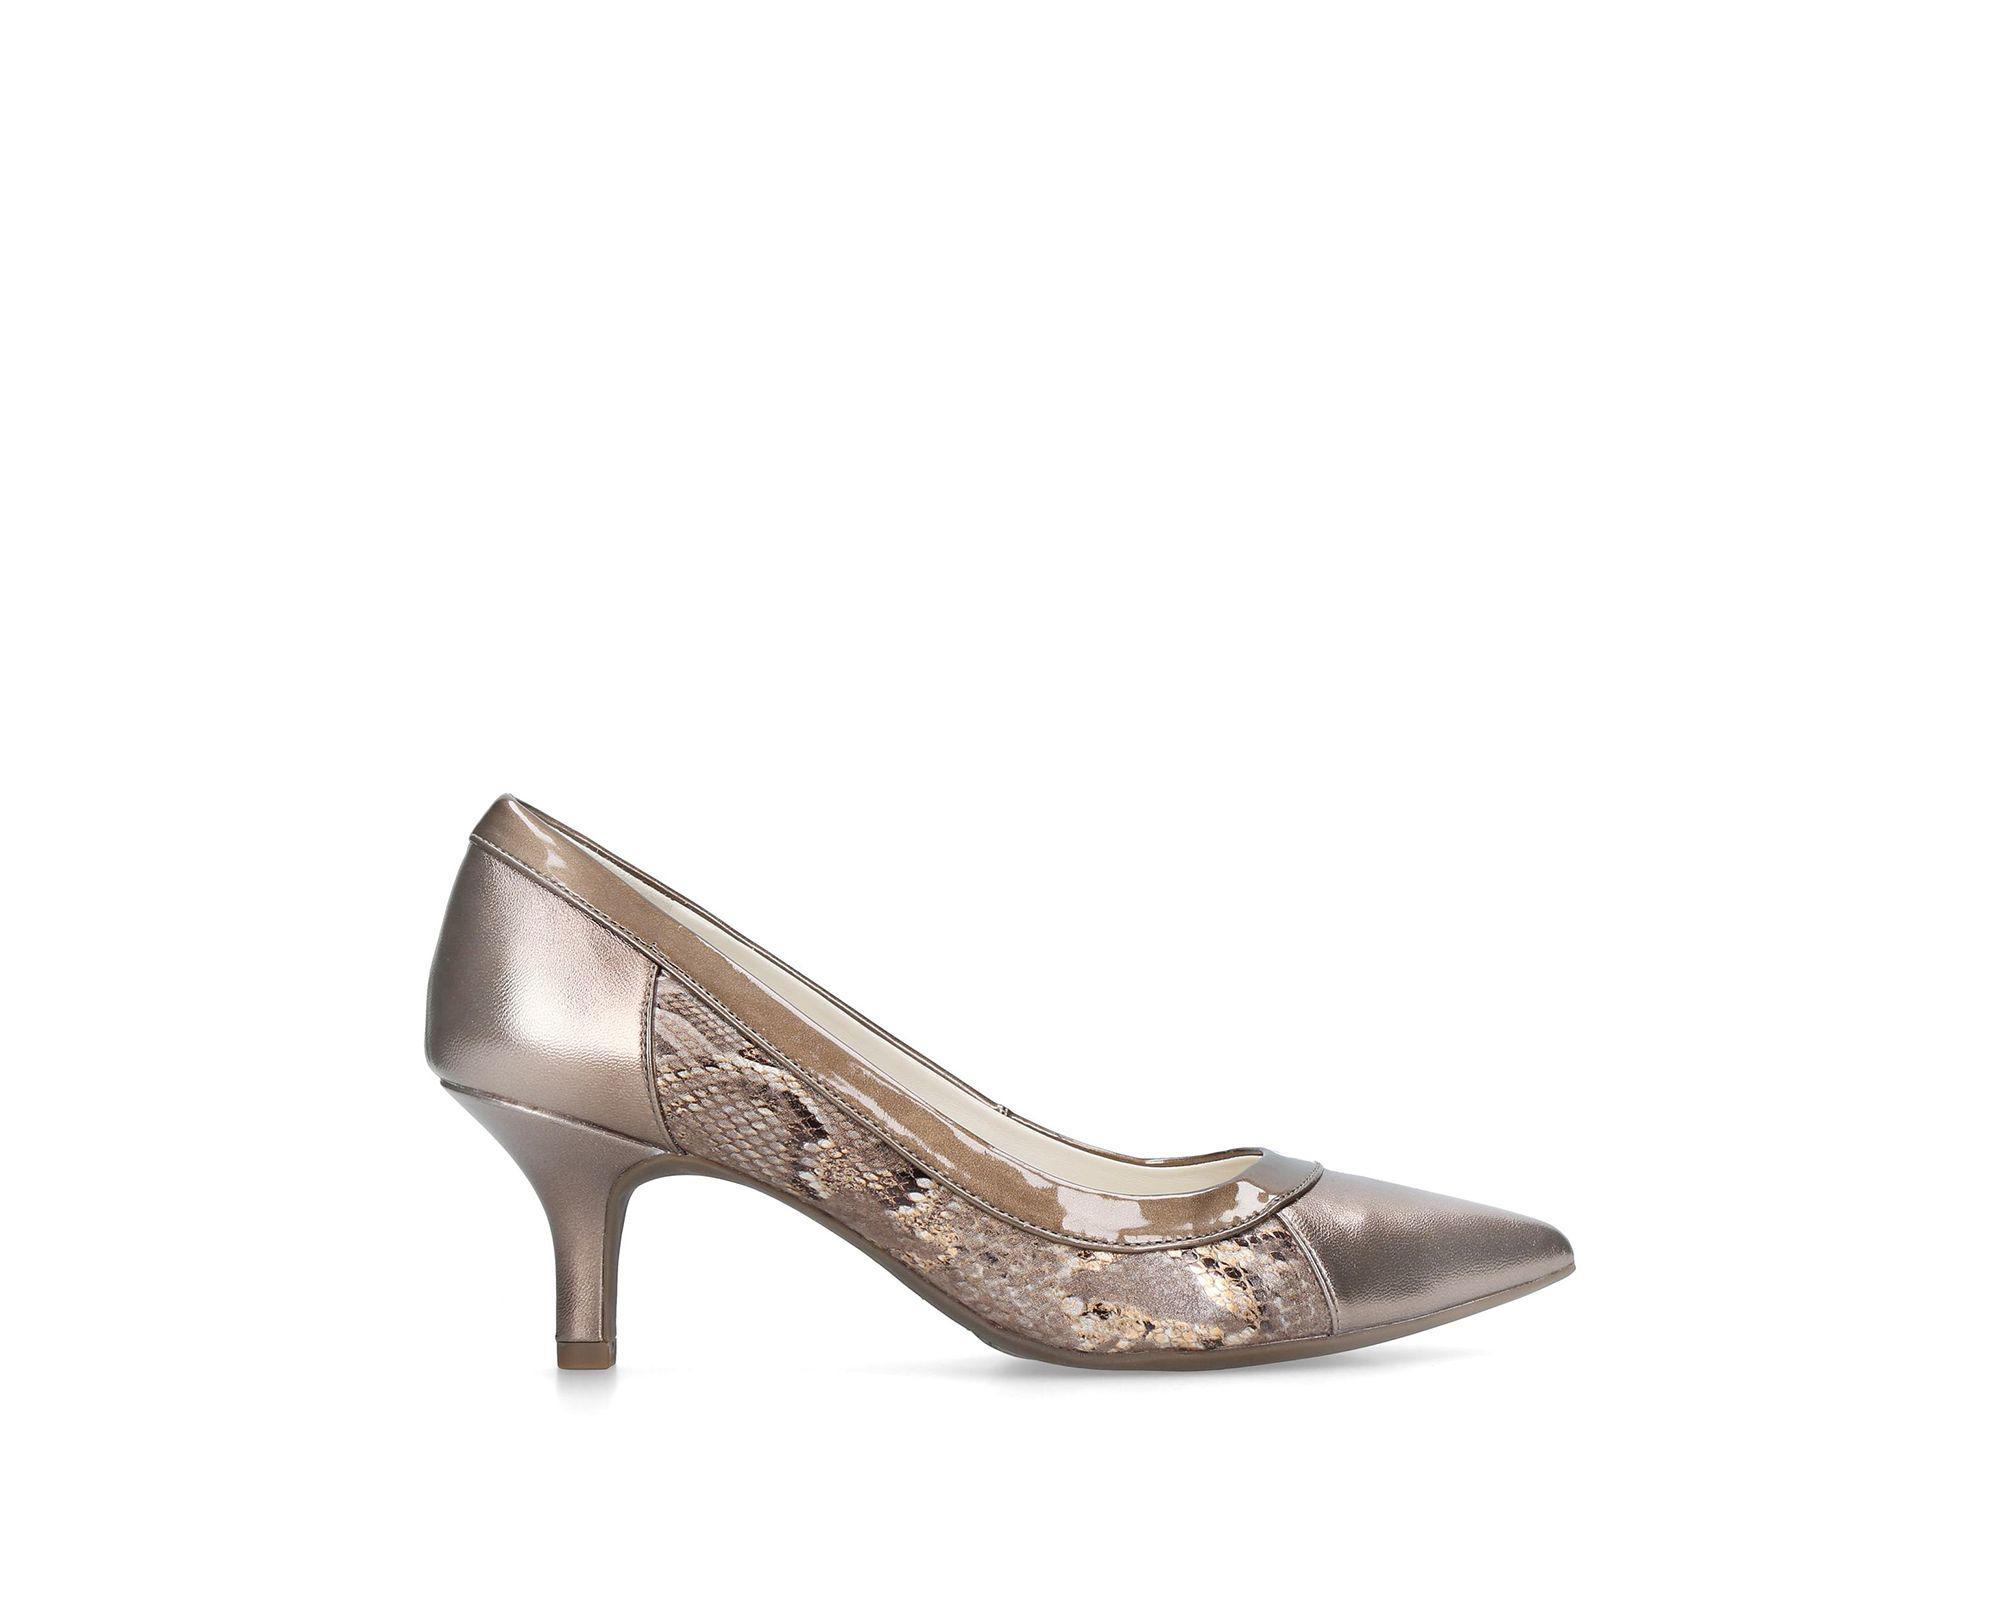 5e1a4e7bc50 Anne Klein Bronze  fabryce  Pointed Toe Court Heels in Metallic - Lyst